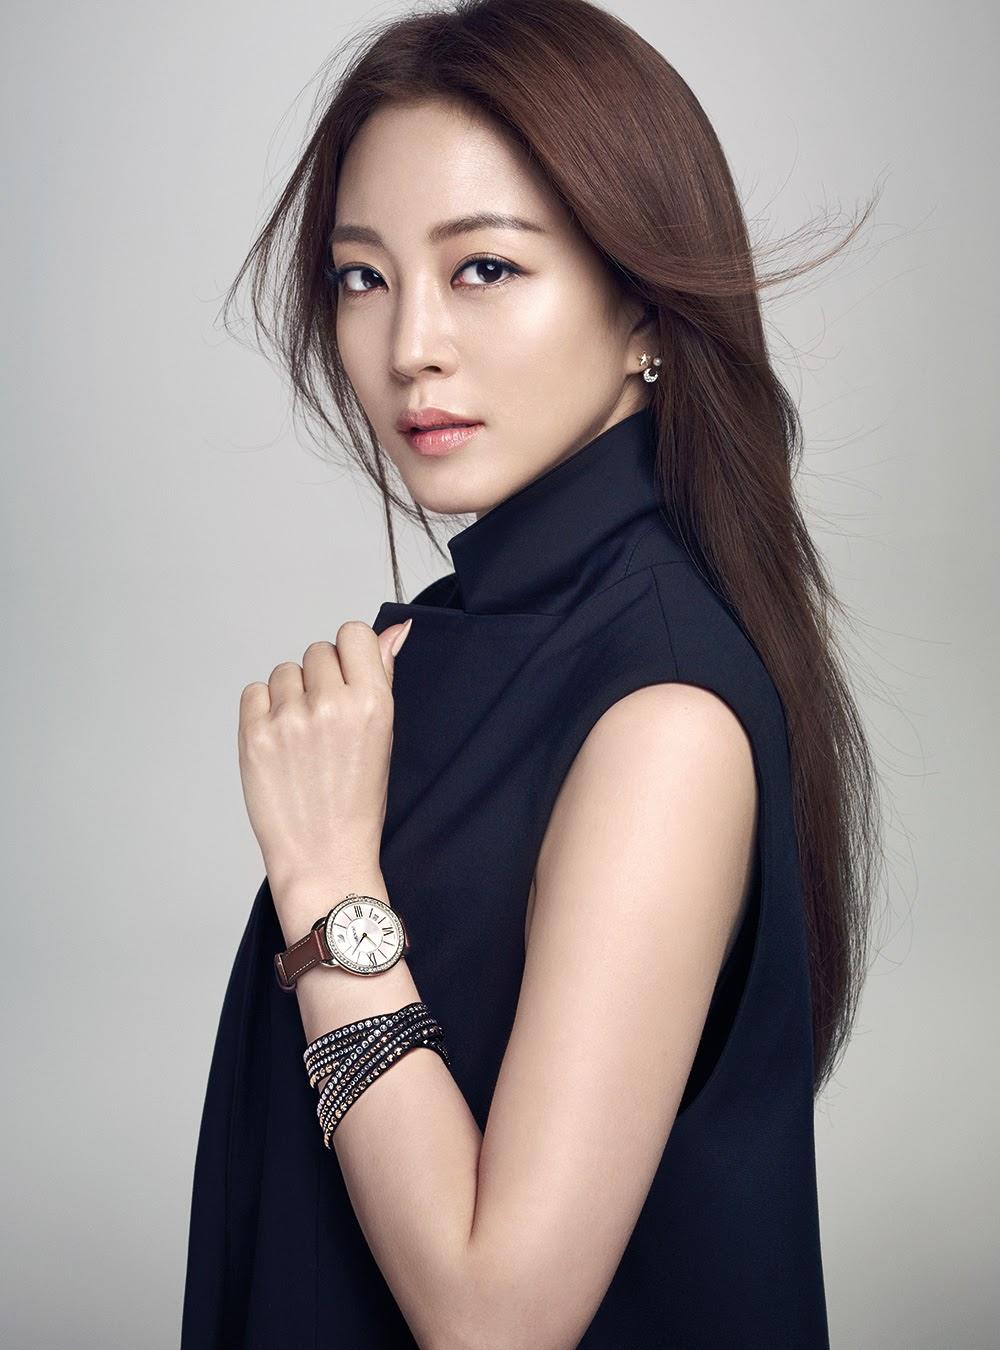 Han-Ye-Seul-Noblesse-Magazine-Apr-2015-S